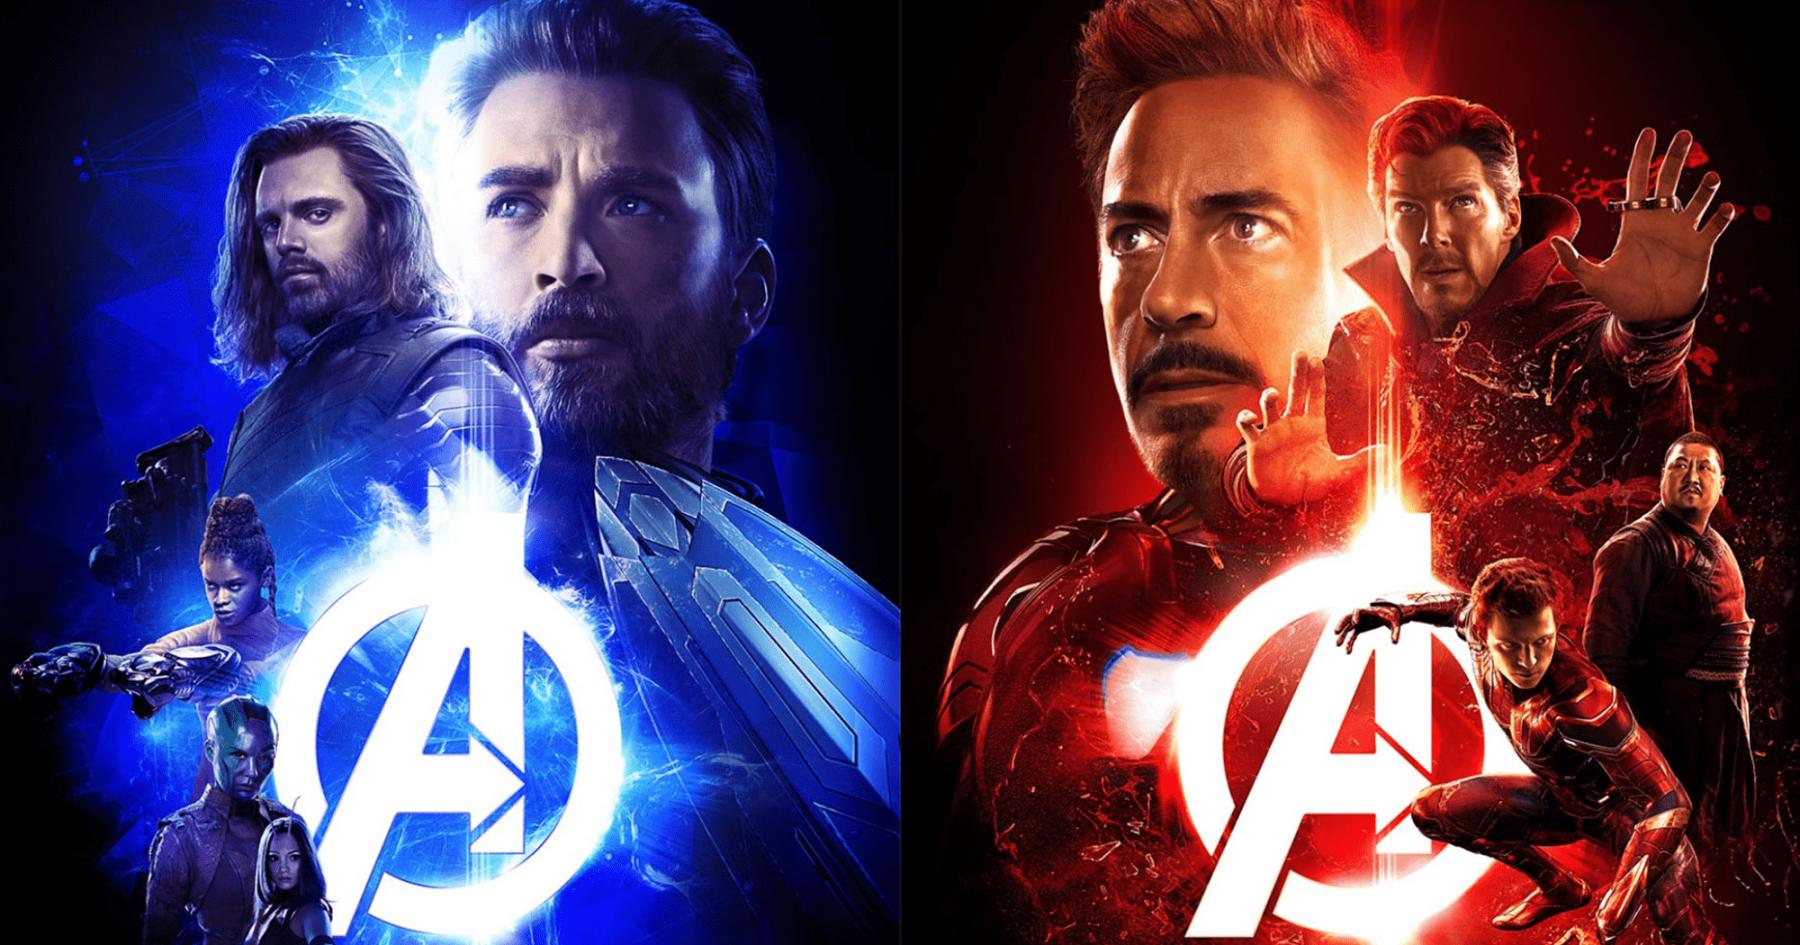 Avengers 4 Wallpapers: Avengers 4 HD Wallpapers